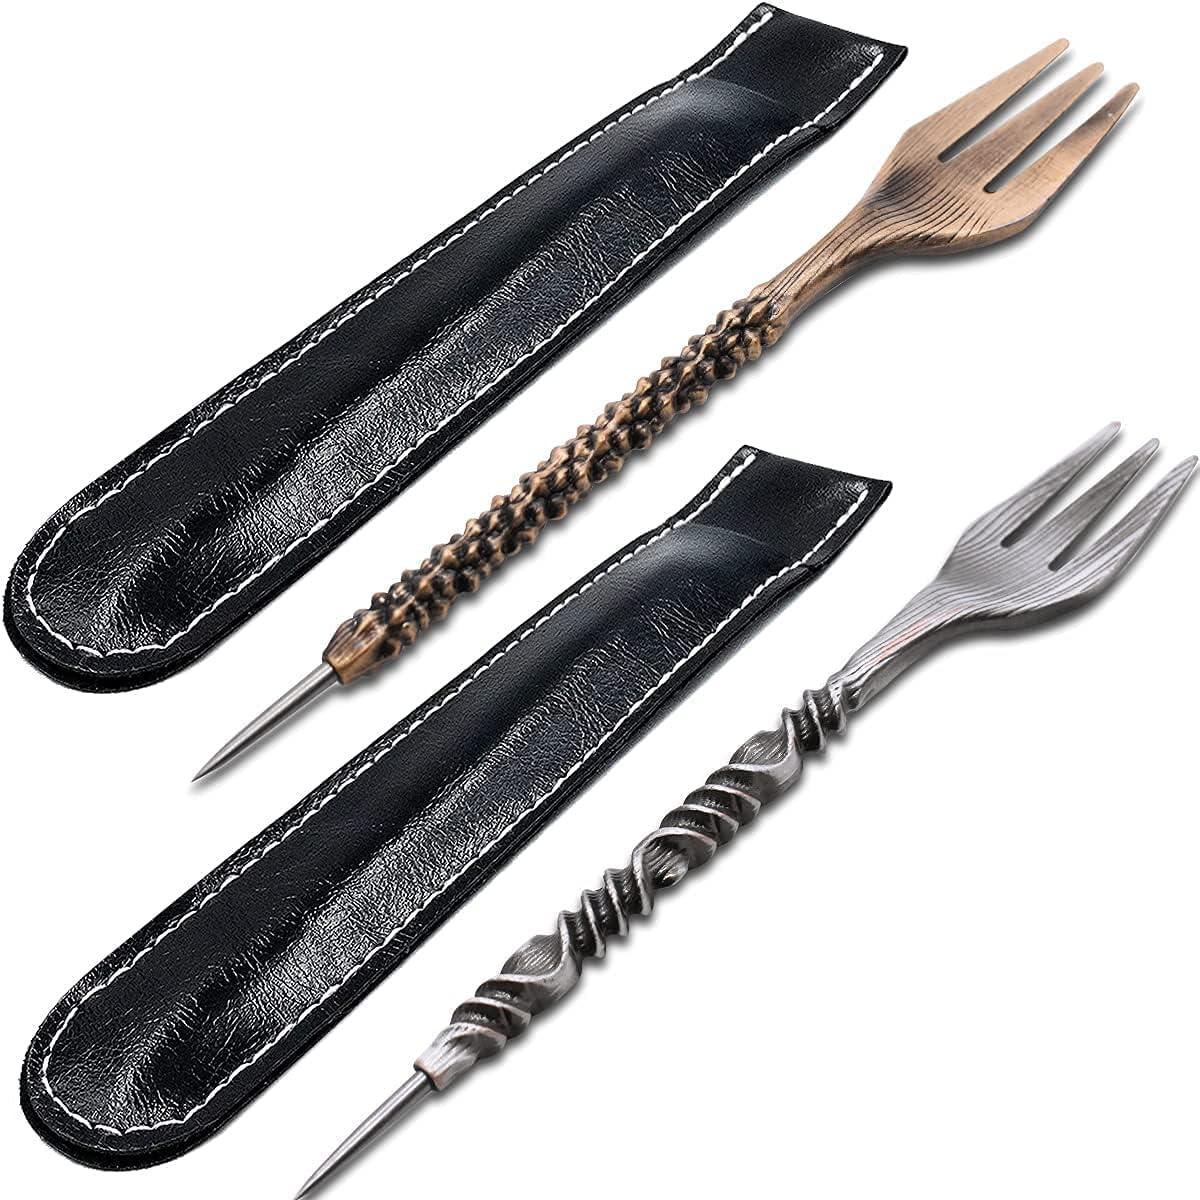 Tenedor para tabaco Accesorios de Metal Hookah Tenedor Punzón 2 en 1 para Cachimba Shisha, Tenedor Triangle Cono Tenedor para Tabaco,Perforador